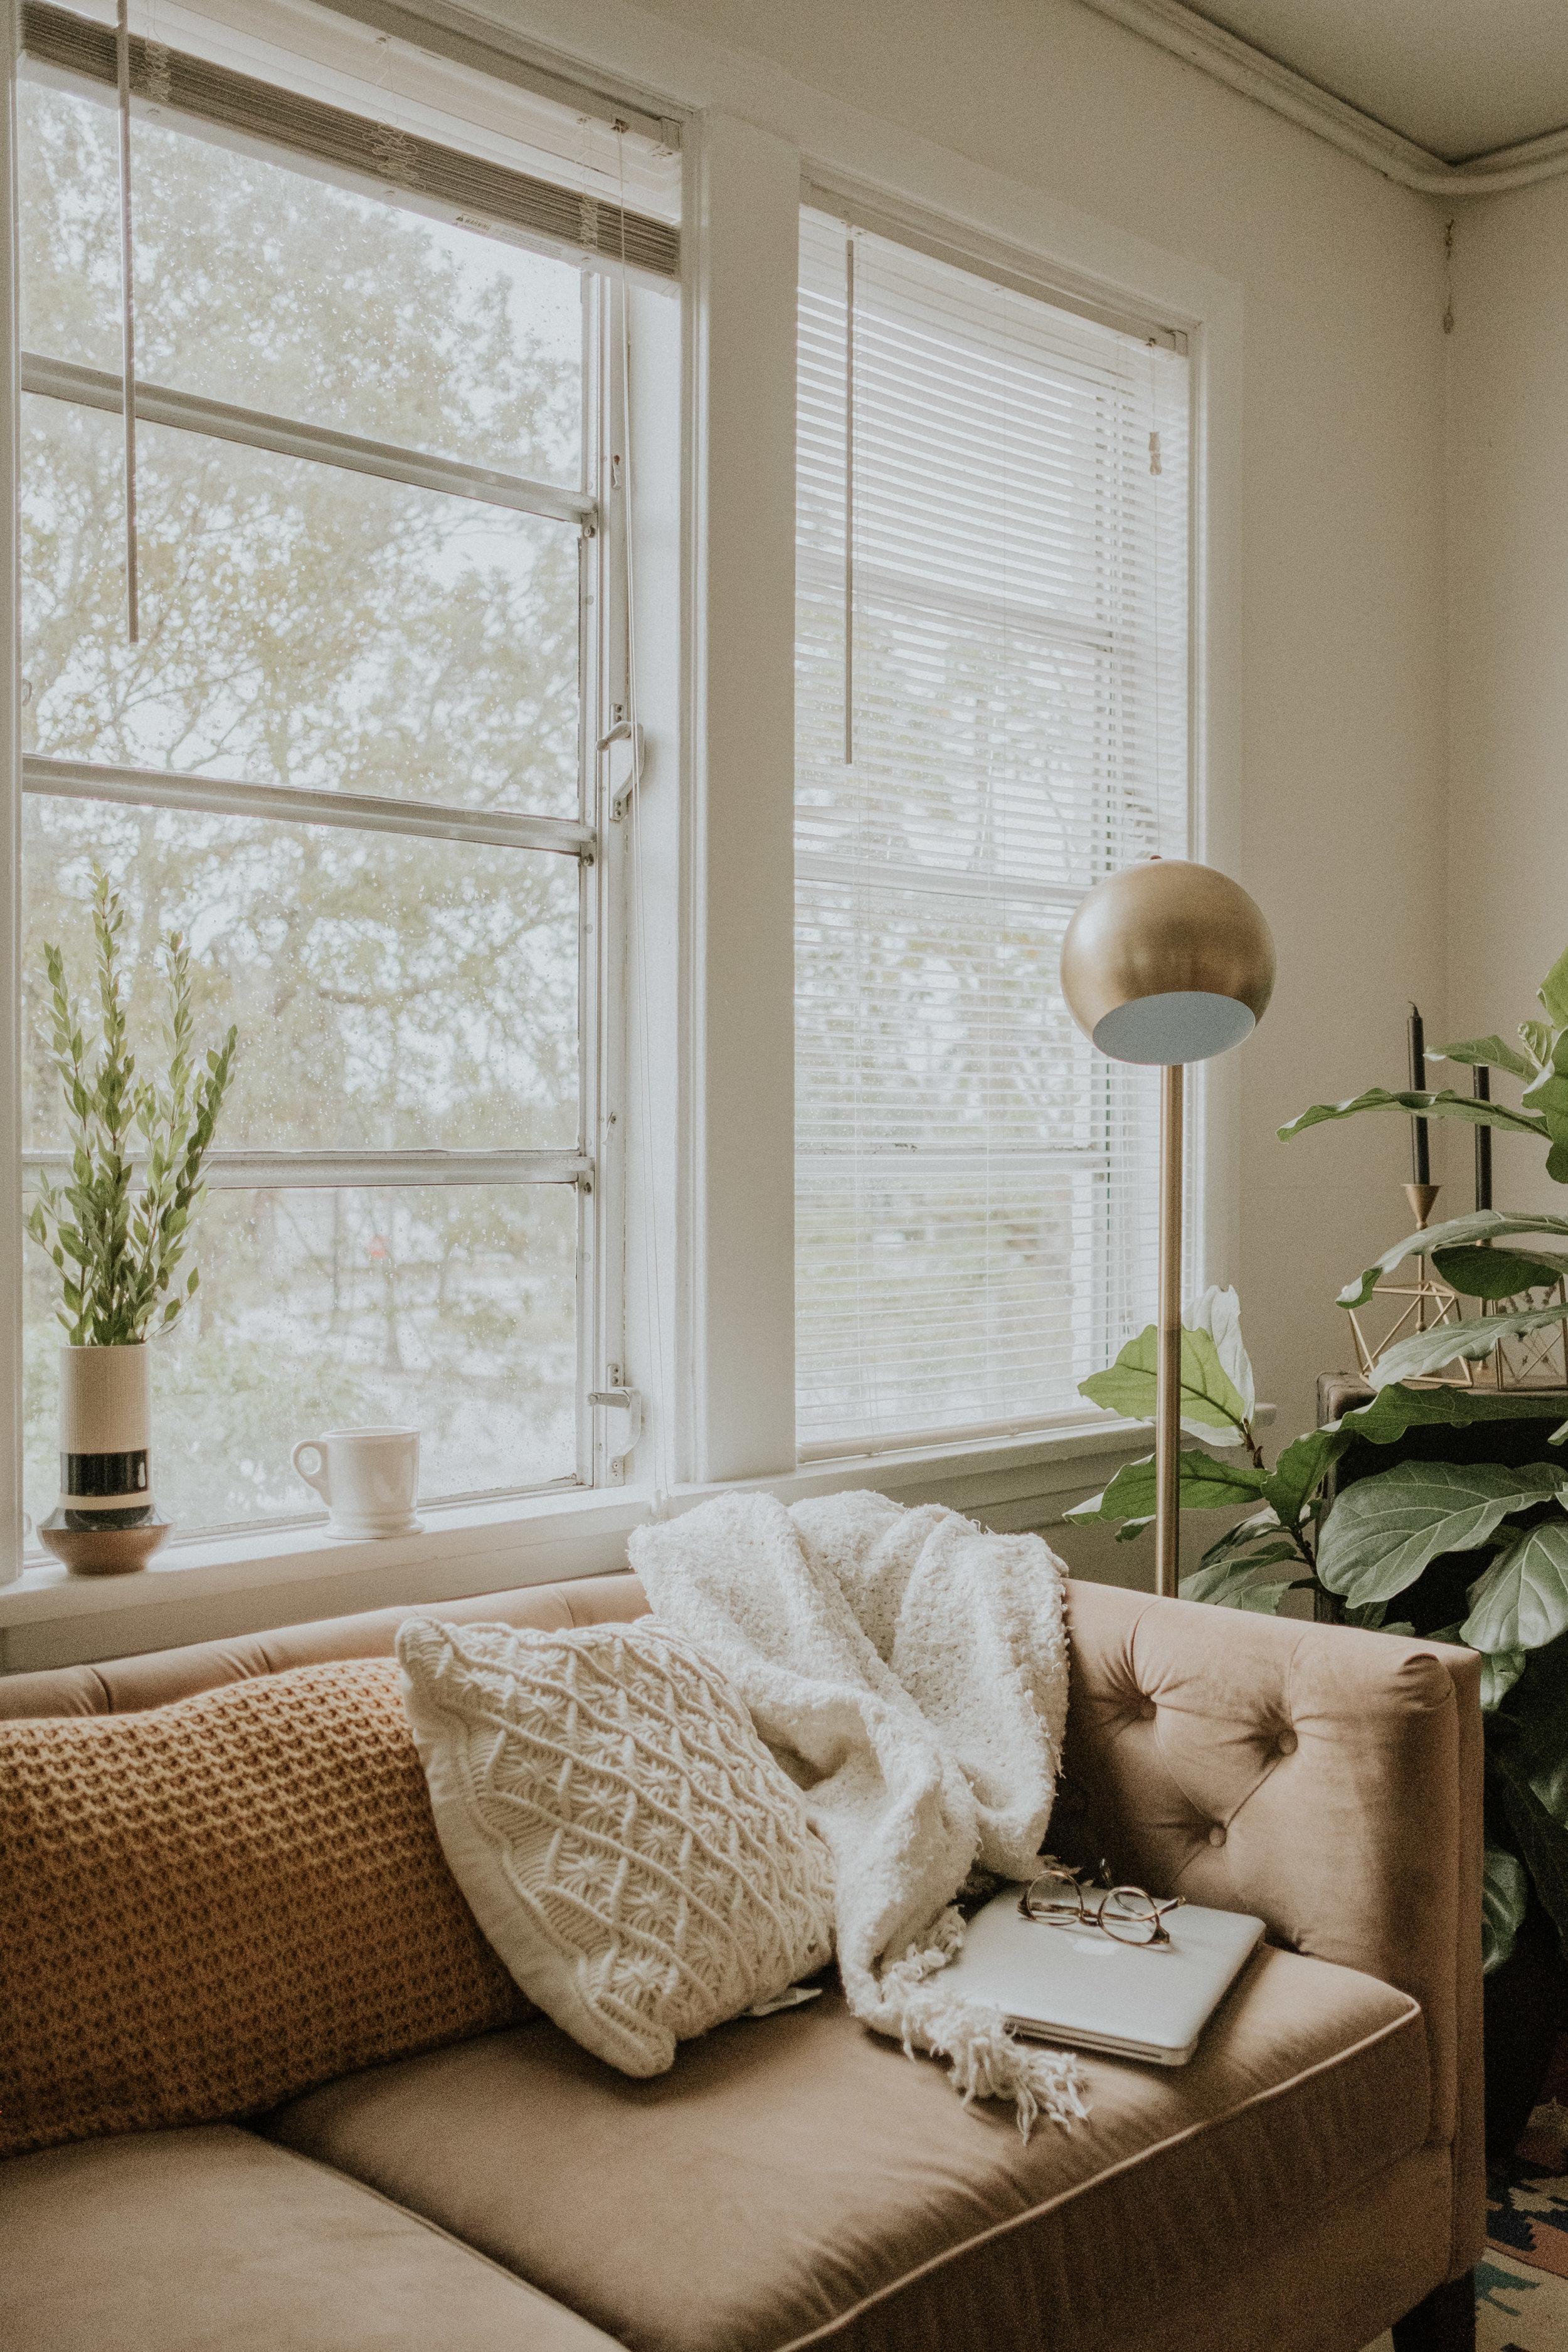 Sofa: World Market (found on Craigslist)